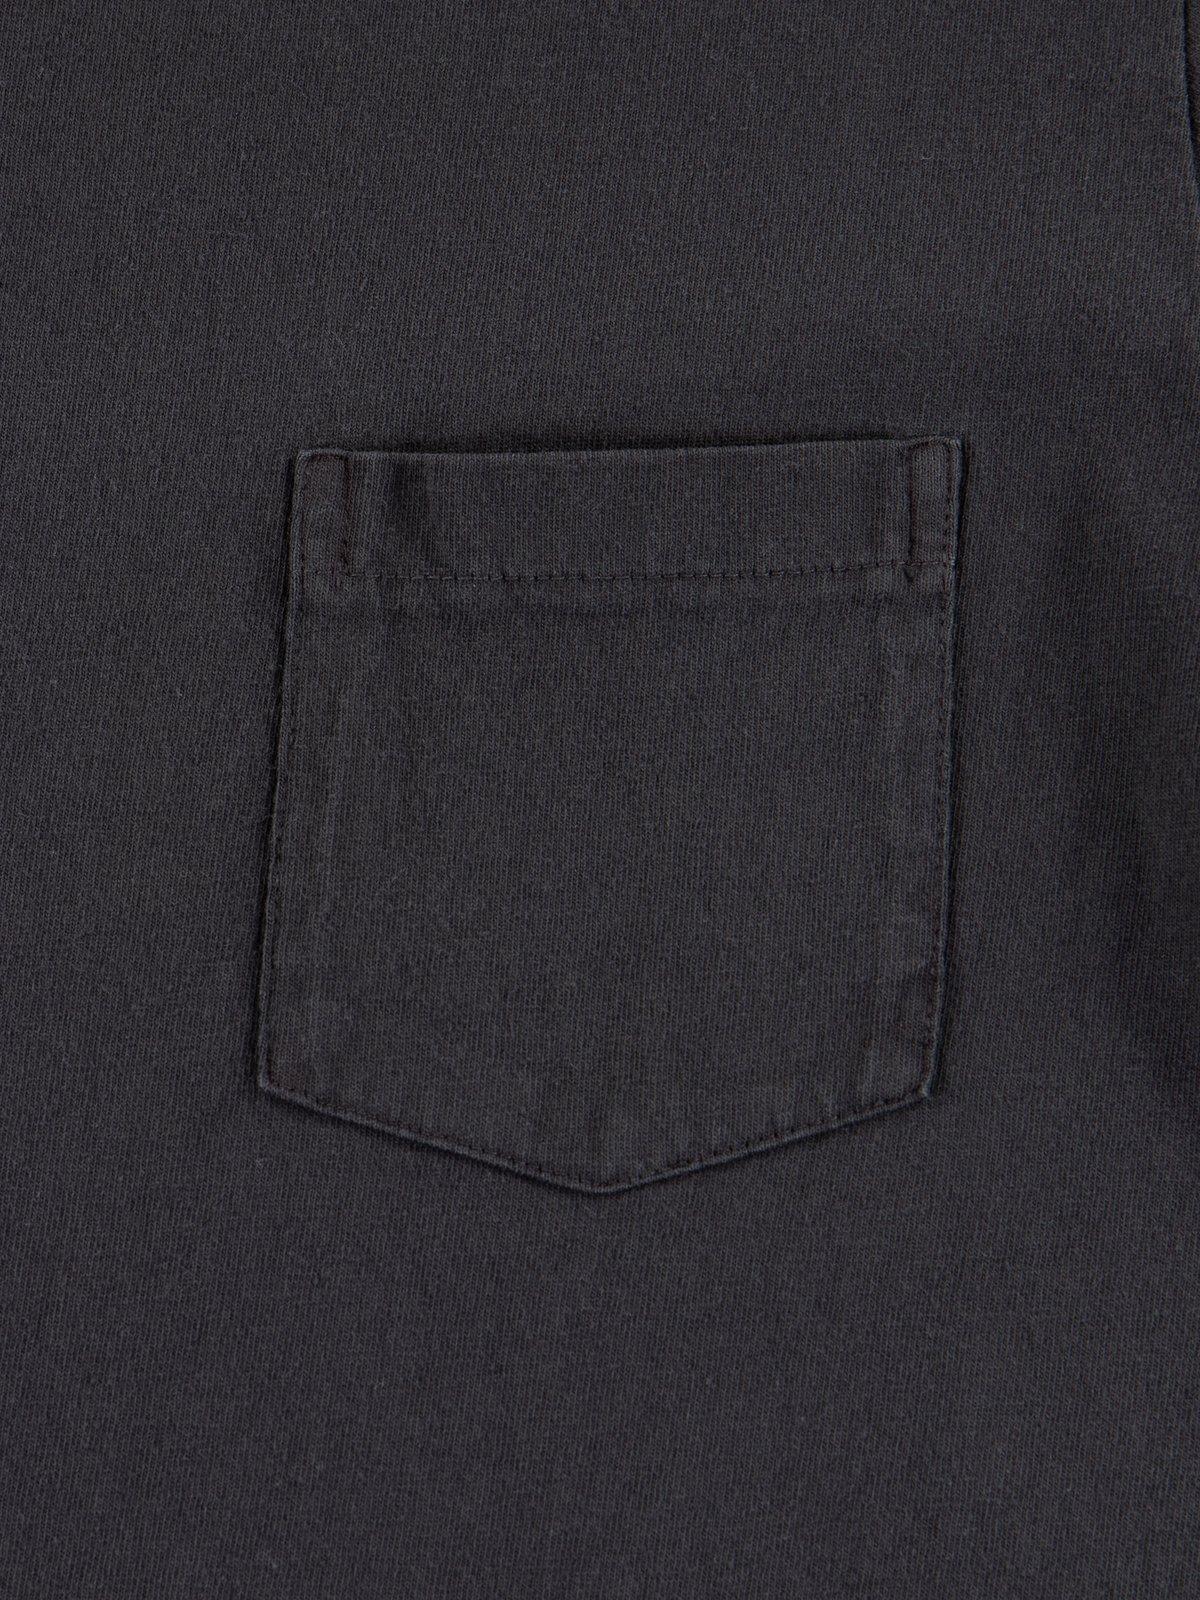 Black Pigment Dye Pocket Tee - Image 3